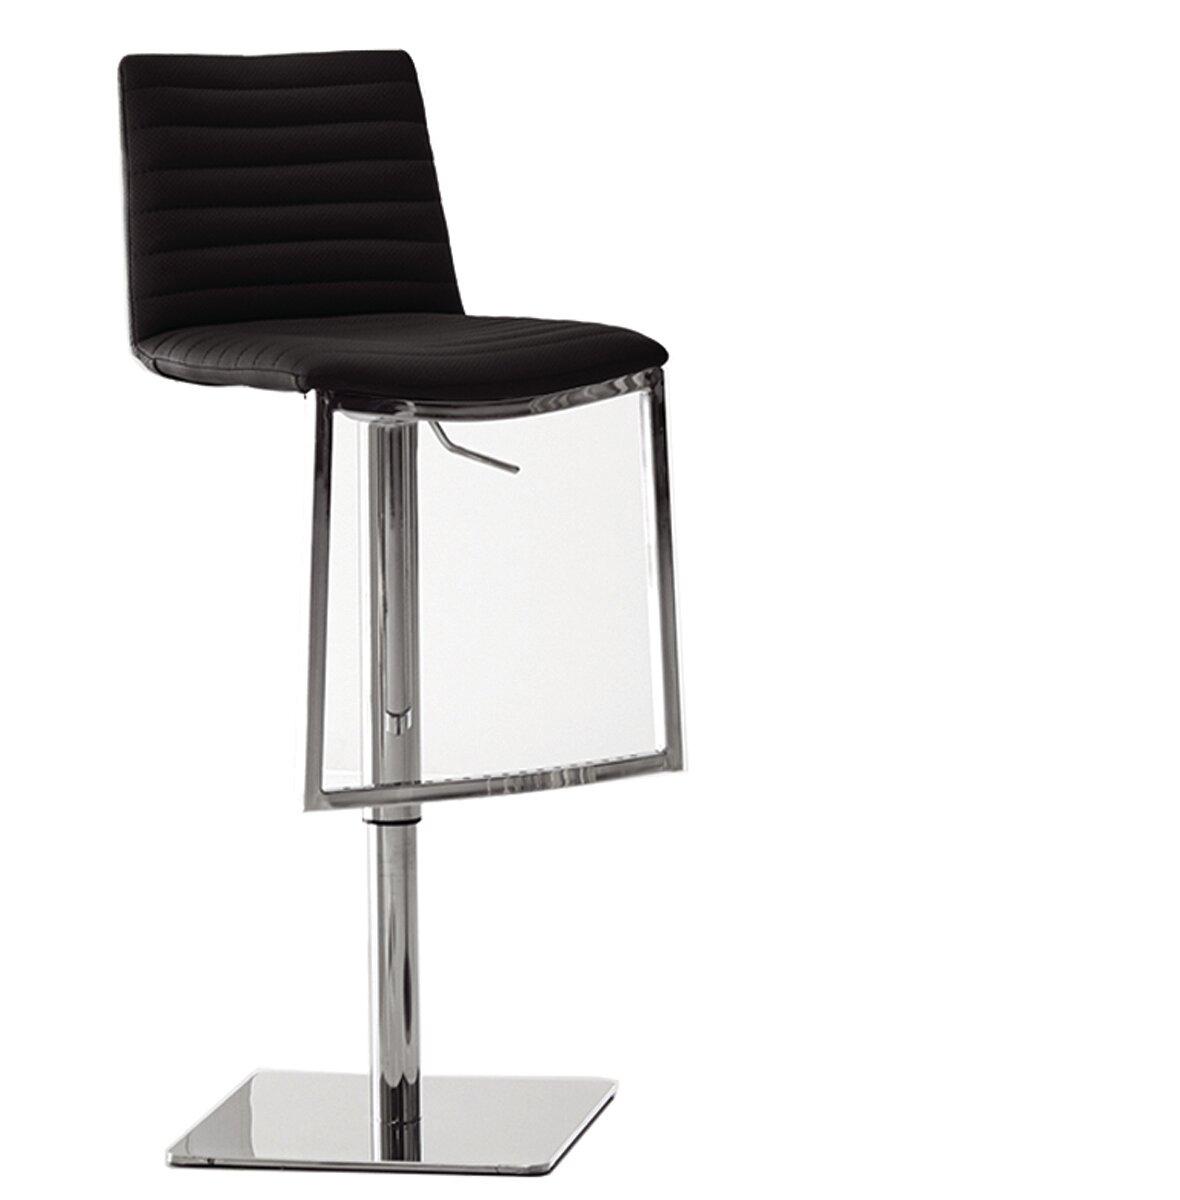 Admirable London Adjustable Height Swivel Bar Stool Lamtechconsult Wood Chair Design Ideas Lamtechconsultcom